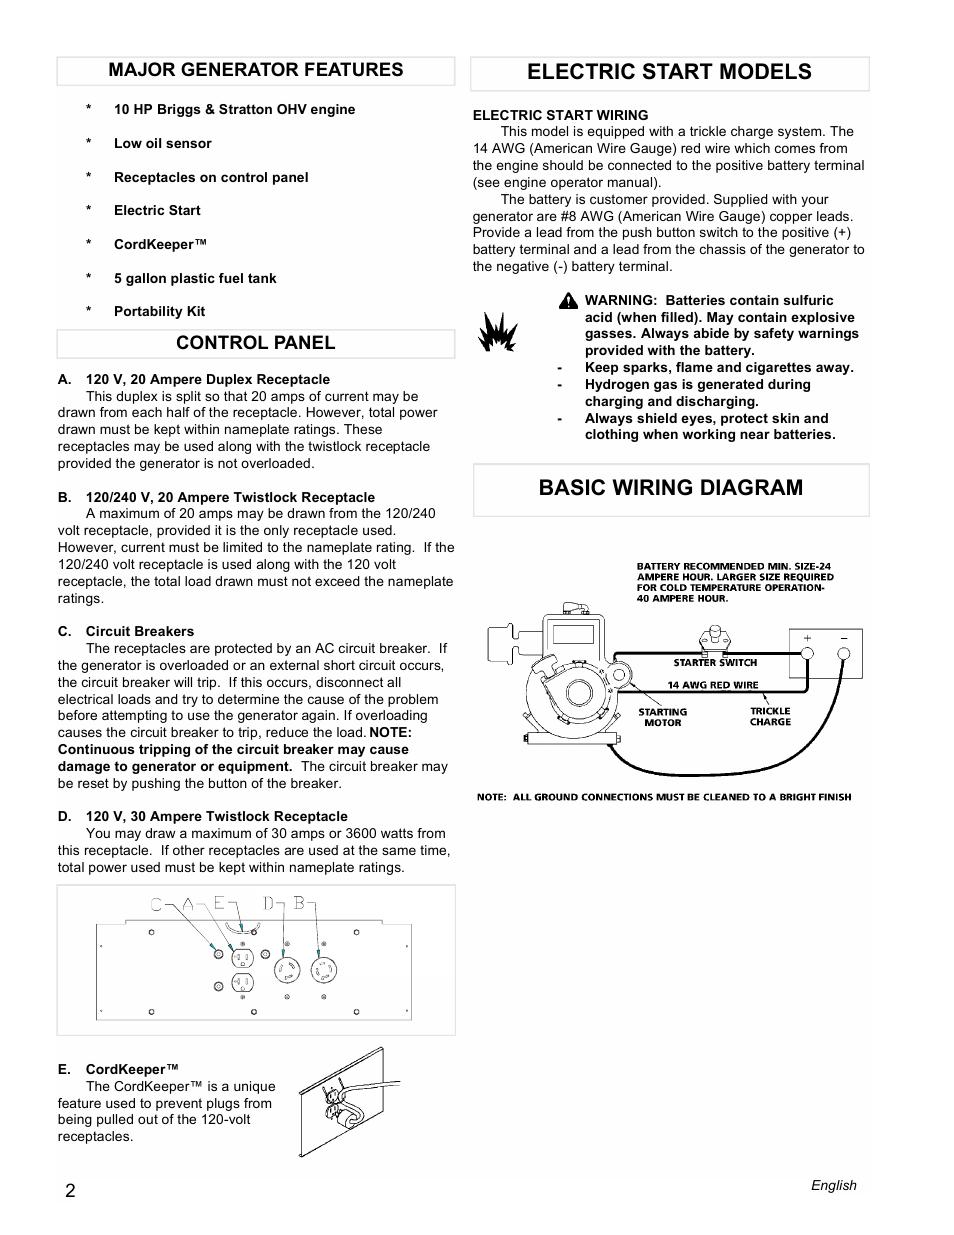 medium resolution of electric start models basic wiring diagram control panel major generator features powermate pma505622 user manual page 2 12